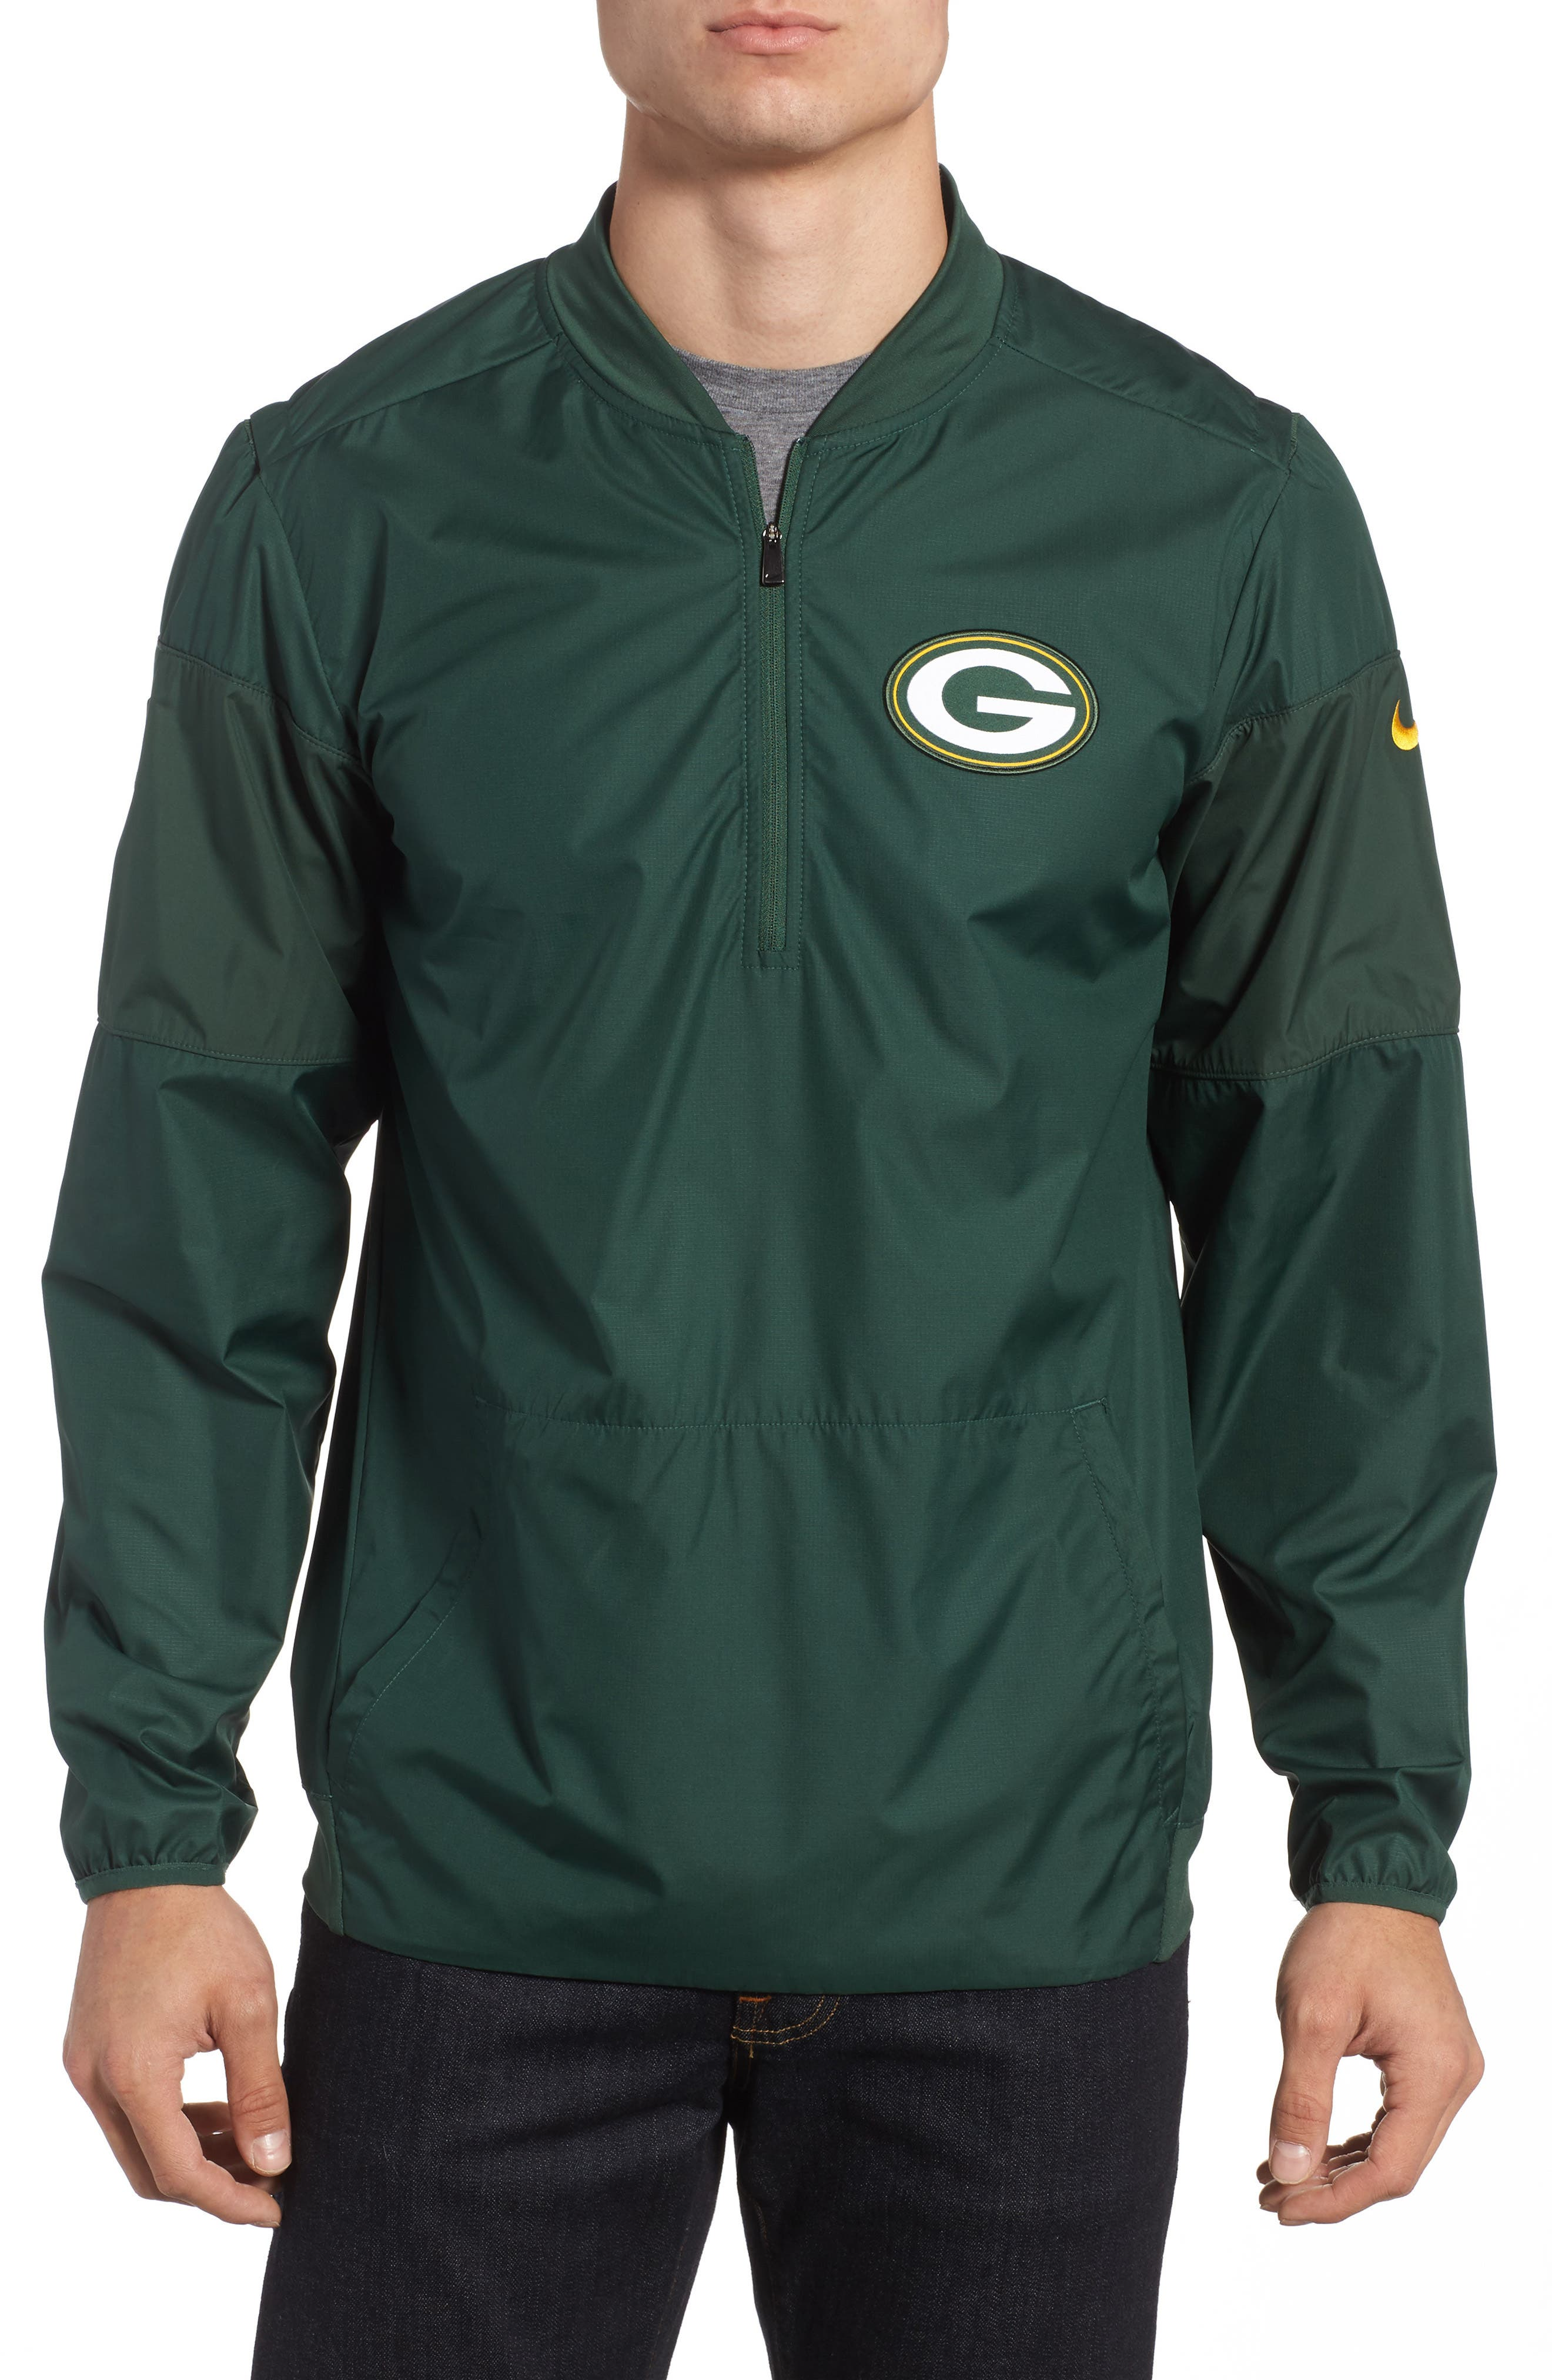 Alternate Image 1 Selected - Nike Lockdown NFL Pullover Jacket